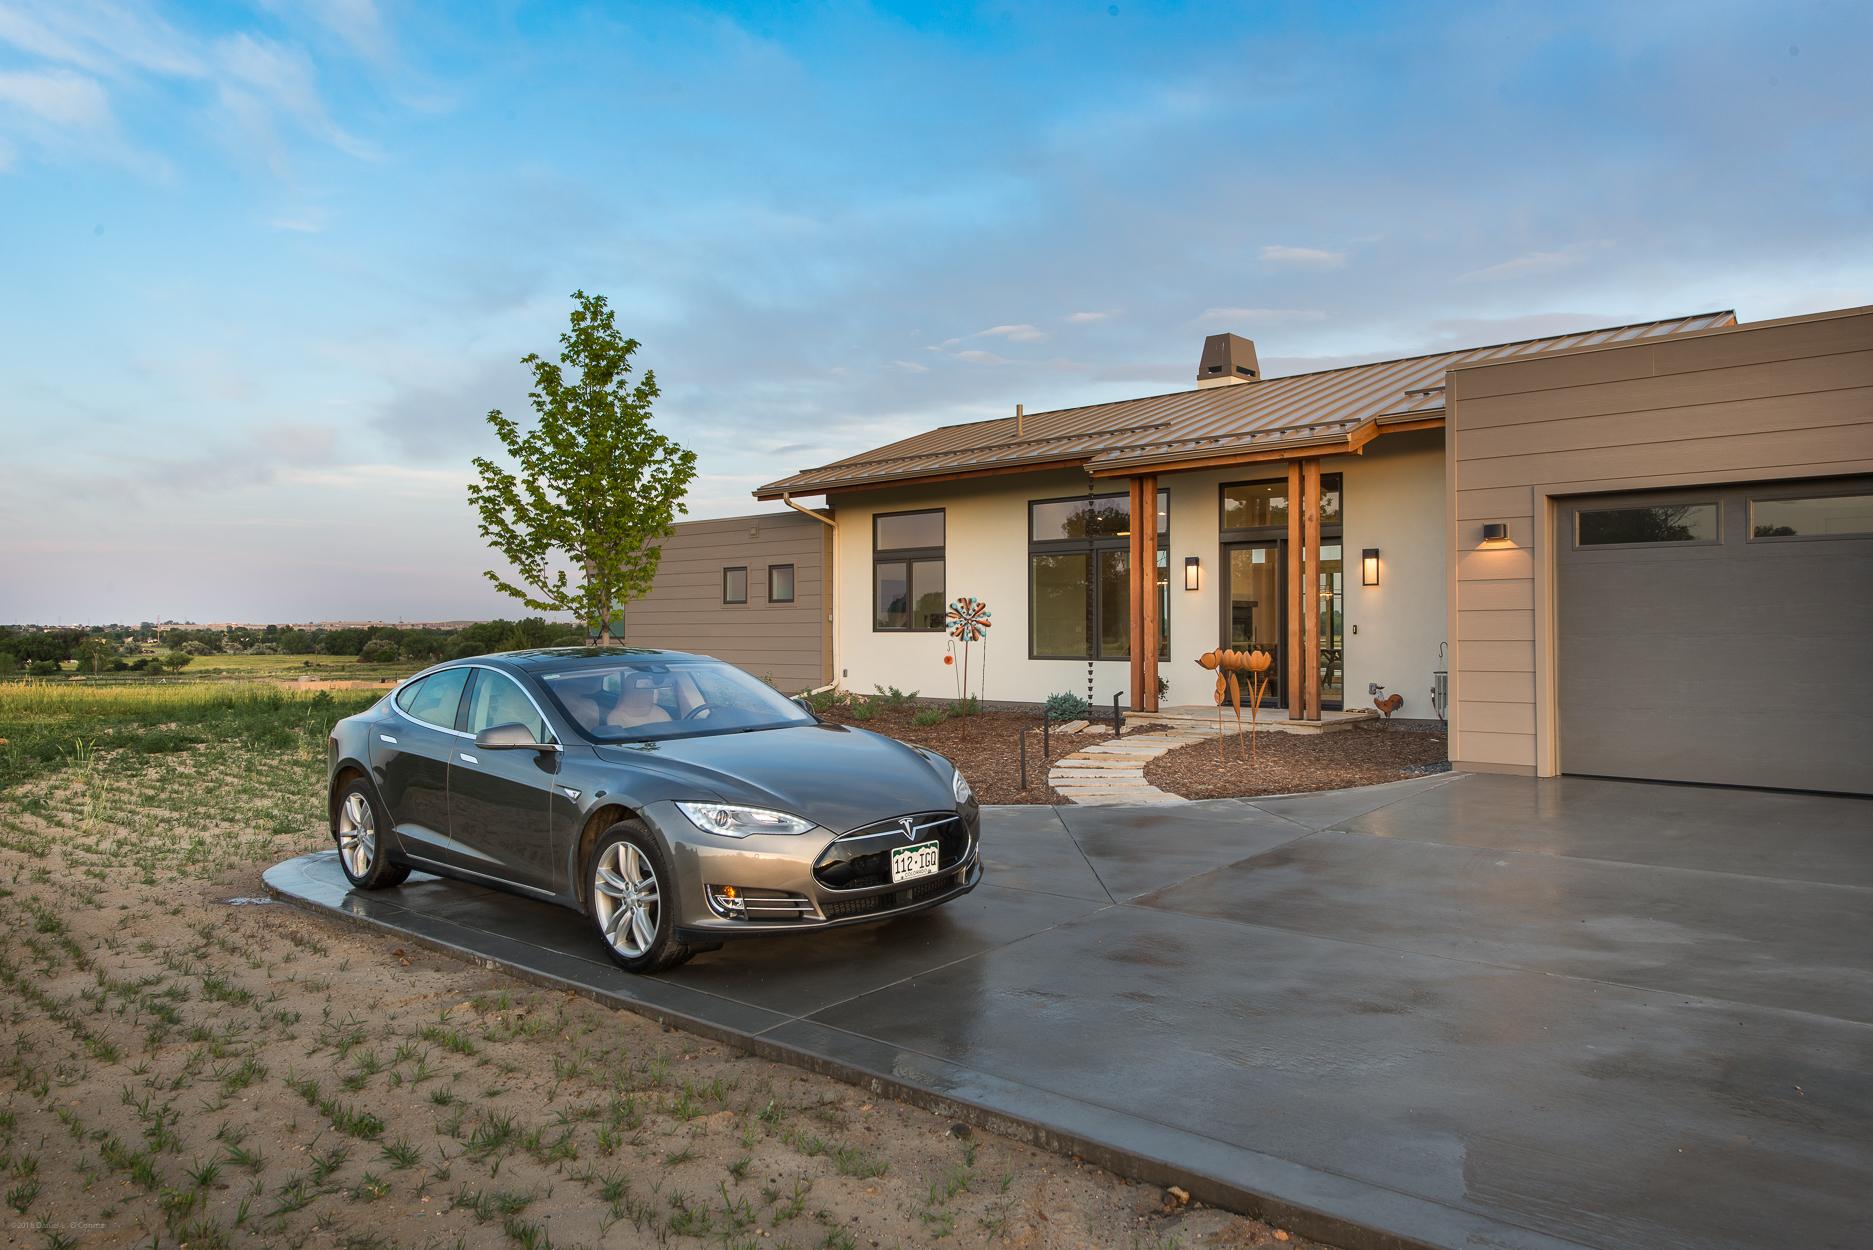 Daylight Front_Tesla.jpg